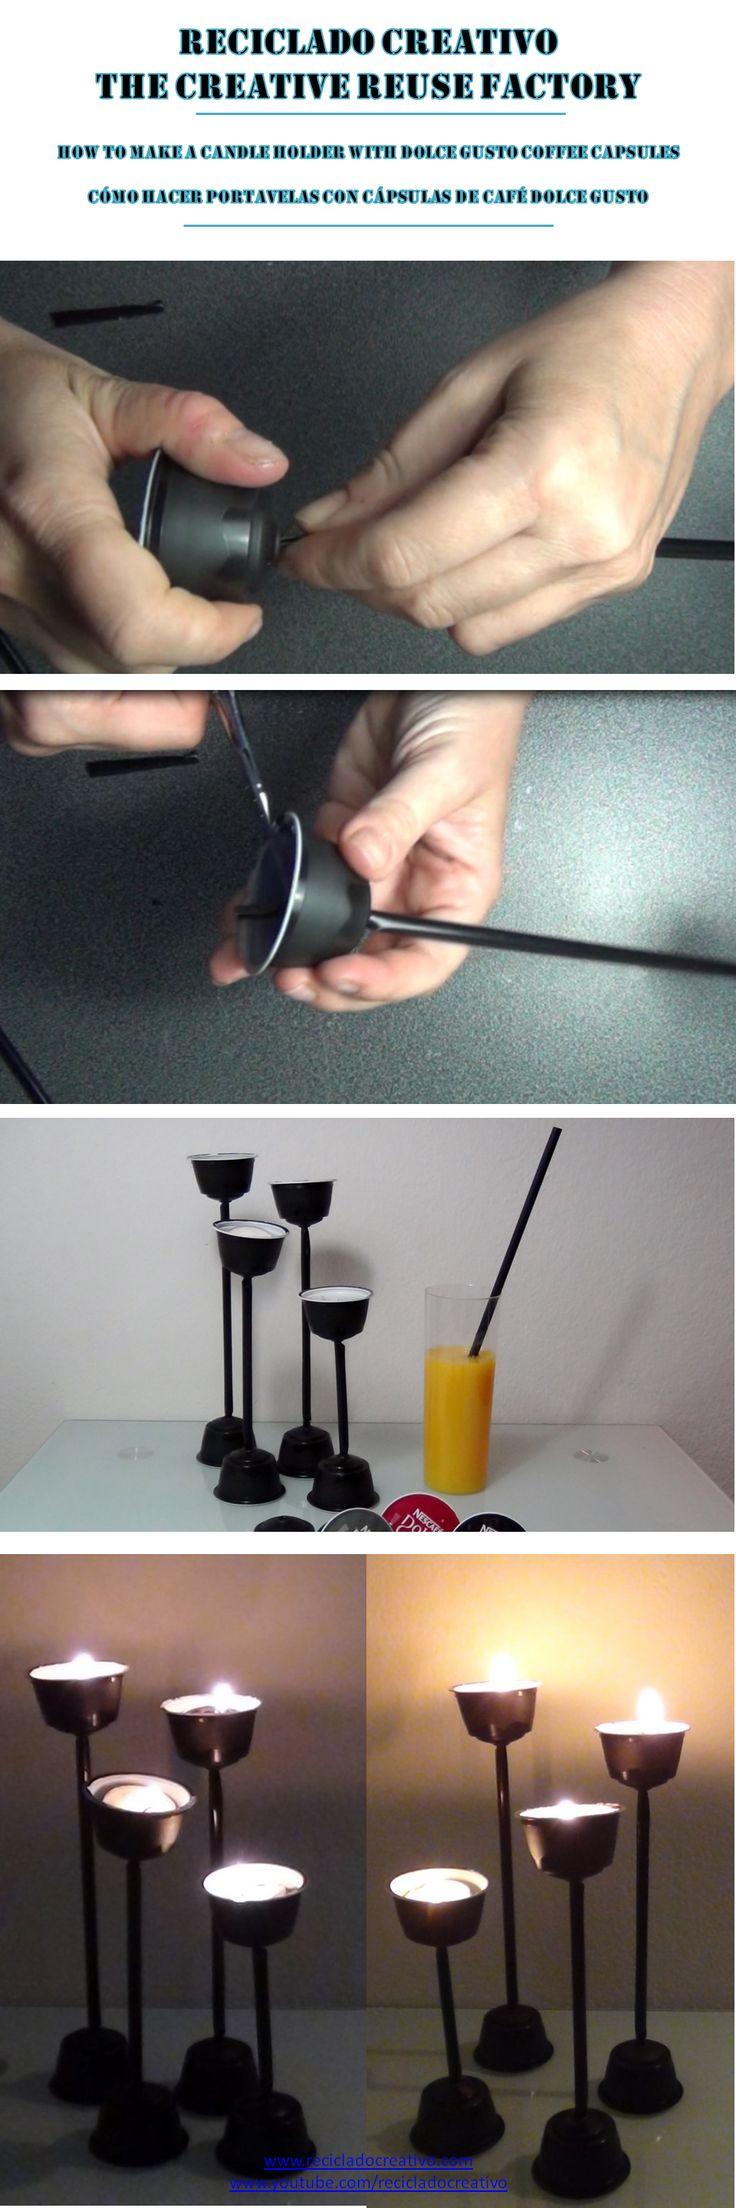 14.How to make a candleholder with Dolce Gusto Coffee capsules - Cómo hacer un portavelas con cápsulas